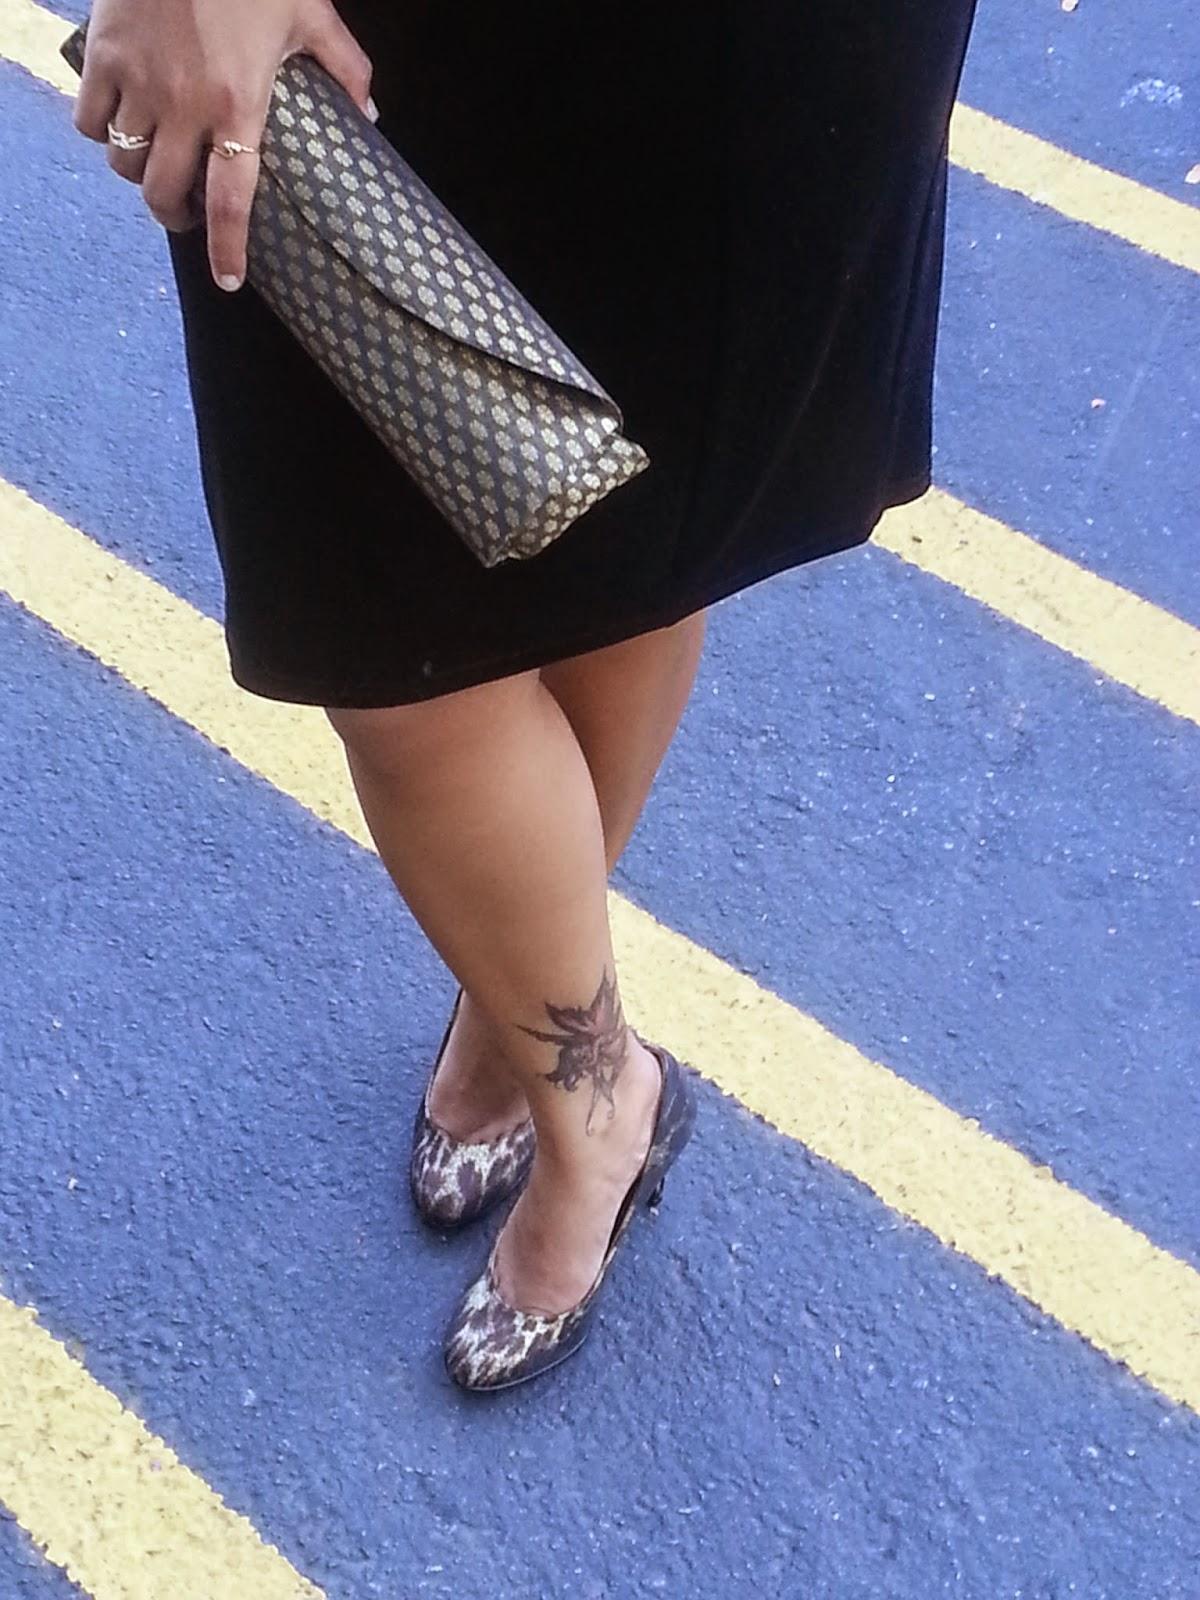 Black Velvet dress, classy black dress, lady like dress, beautiful tattoo on the leg, elegant dress for indian women, famous indian fashion blogger,